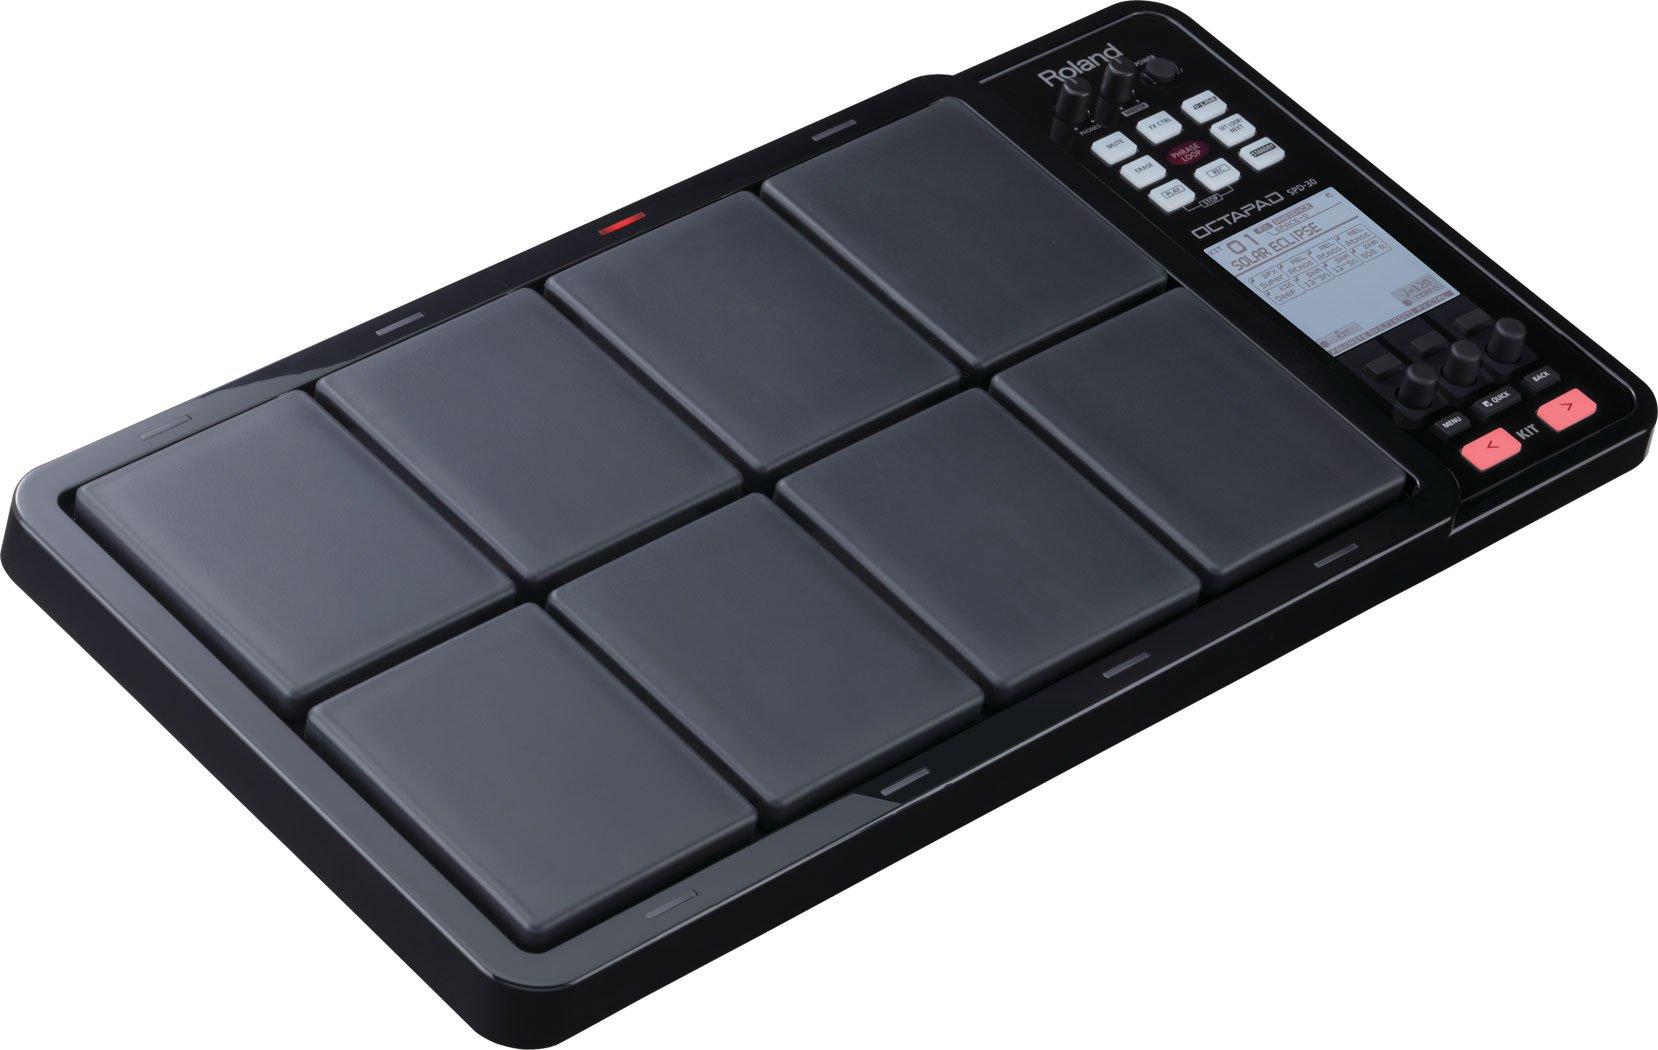 Roland OCTAPAD Digital Percussion Pad, black (SPD-30-BK) by Roland (Image #2)